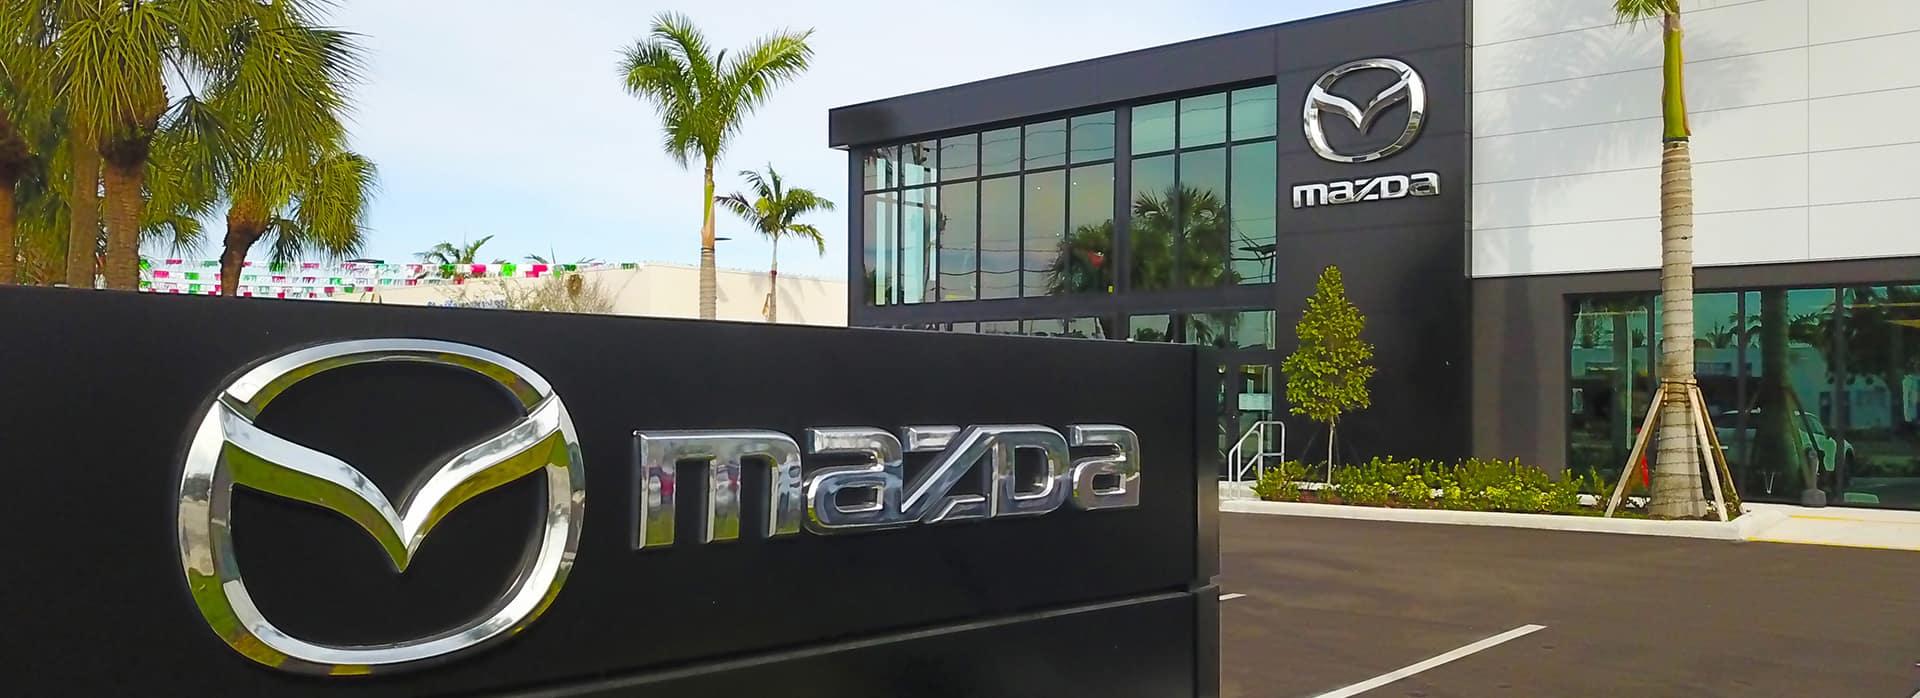 Gunther Mazda building